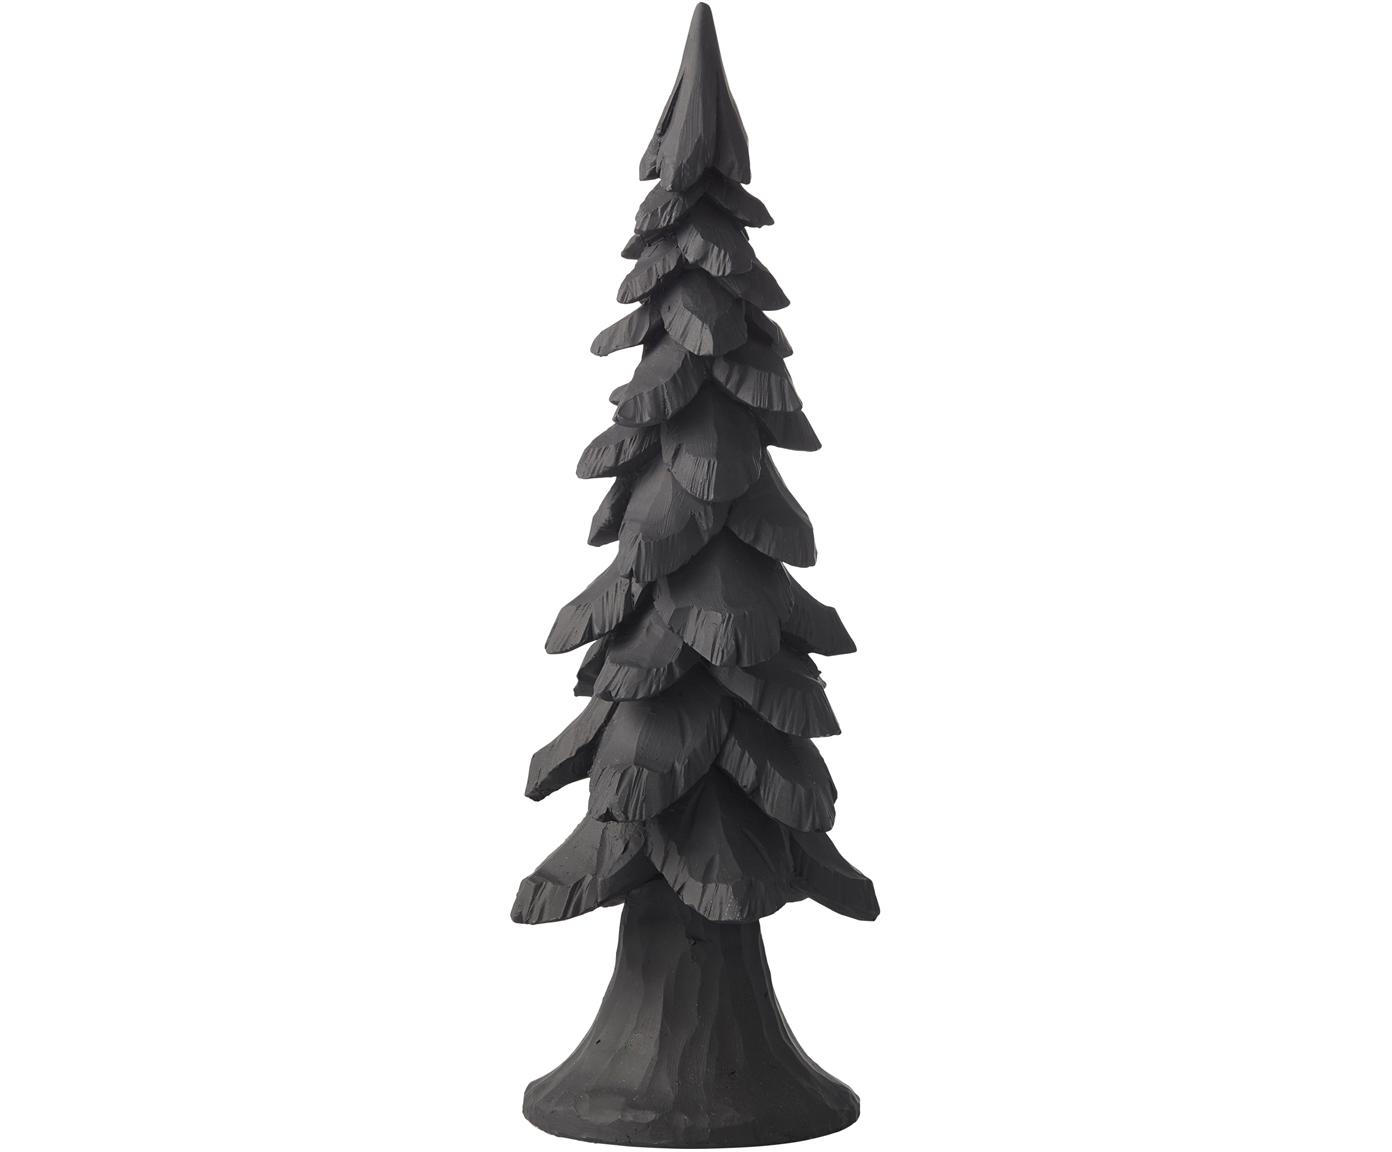 Handgefertigtes Deko-Objekt Tree, Polyresin, Schwarz, Ø 11 x H 34 cm